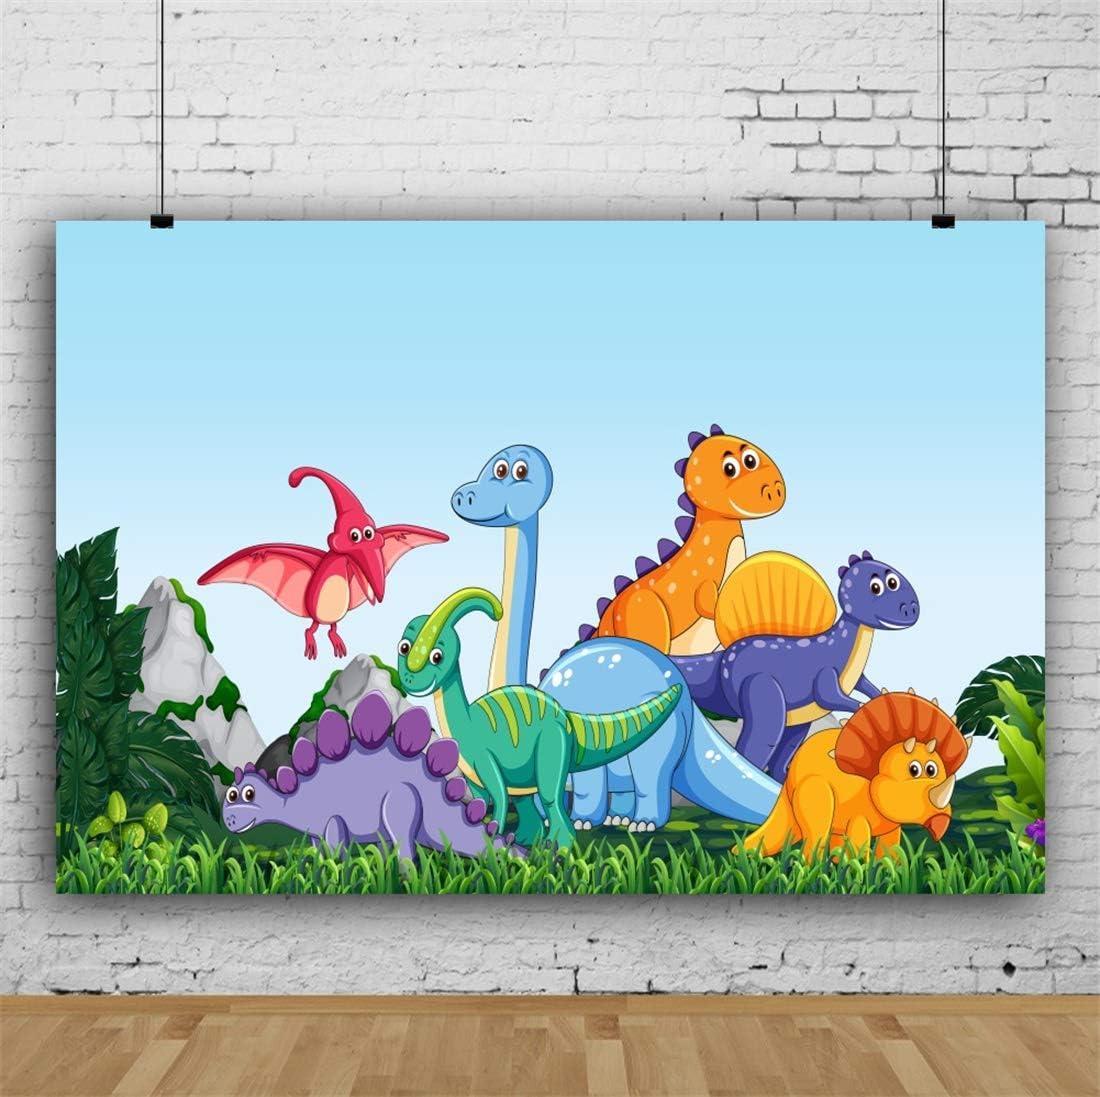 Yeele 10x8ft Happy Birthday Photography Background Cartoon Dinosaur Pterosaur Stegosaurus Grassland Birthday Party Decoration Baby Photo Backdrop Studio Props Video Drape